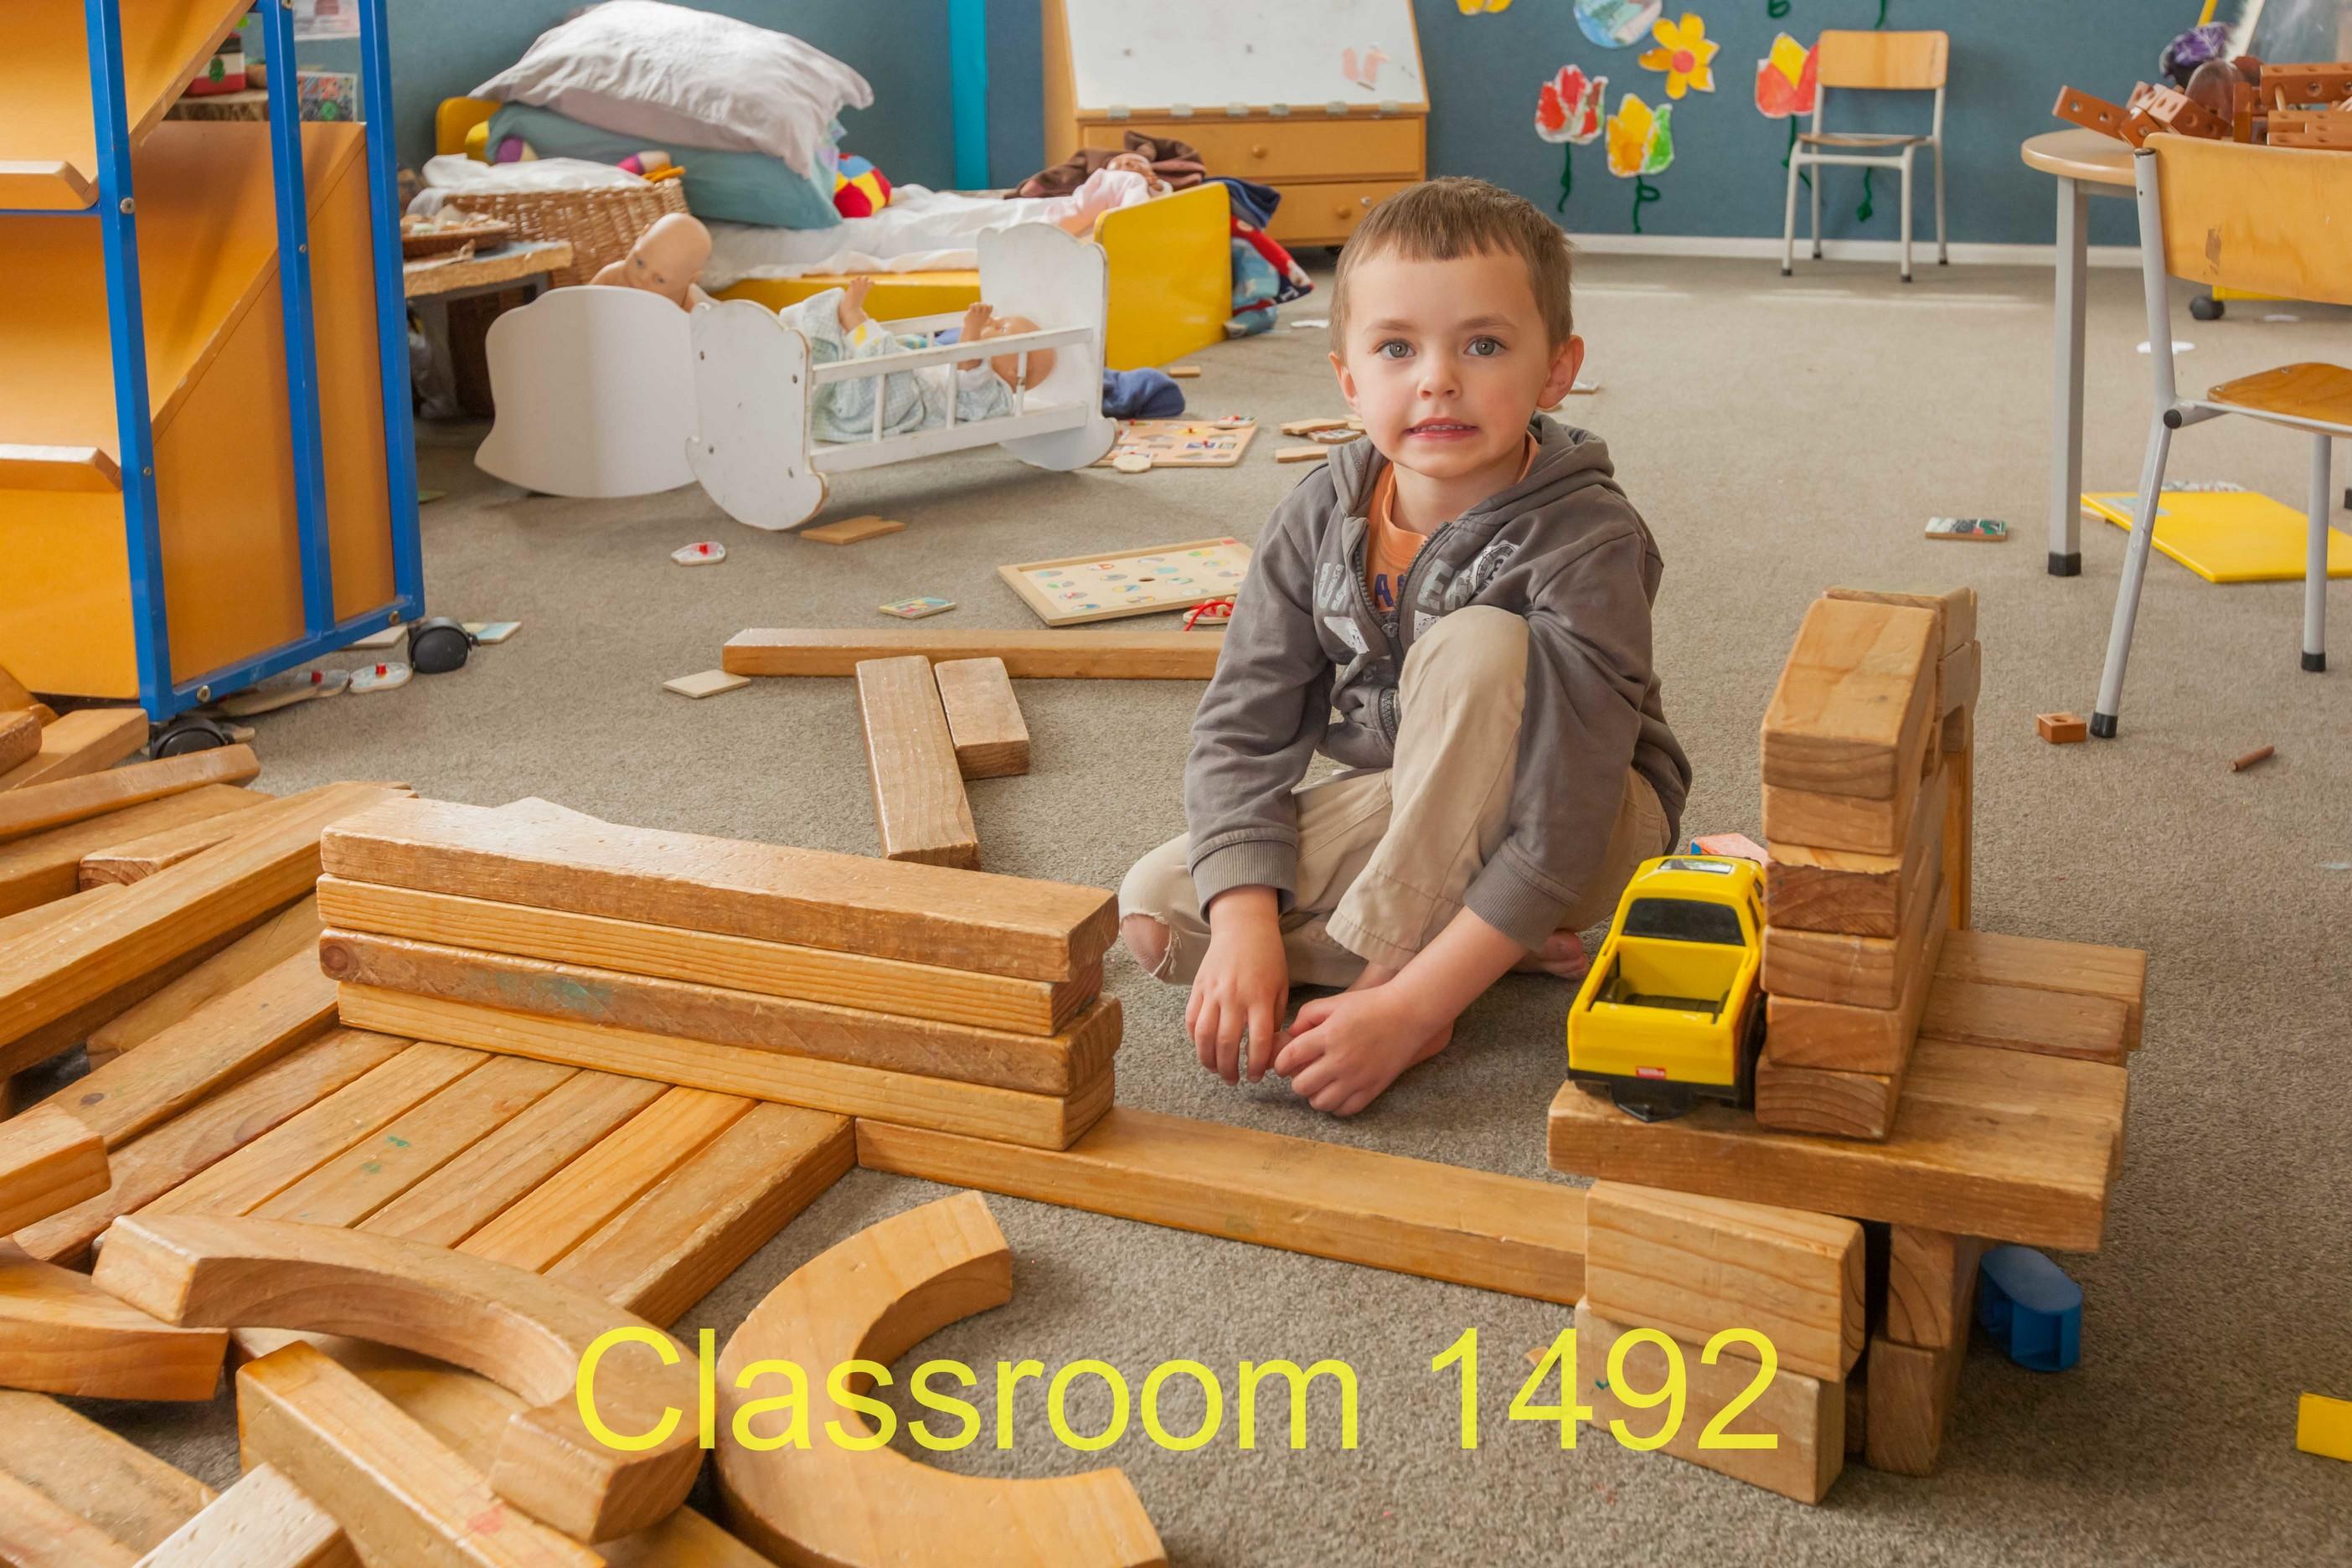 Classroom 1492